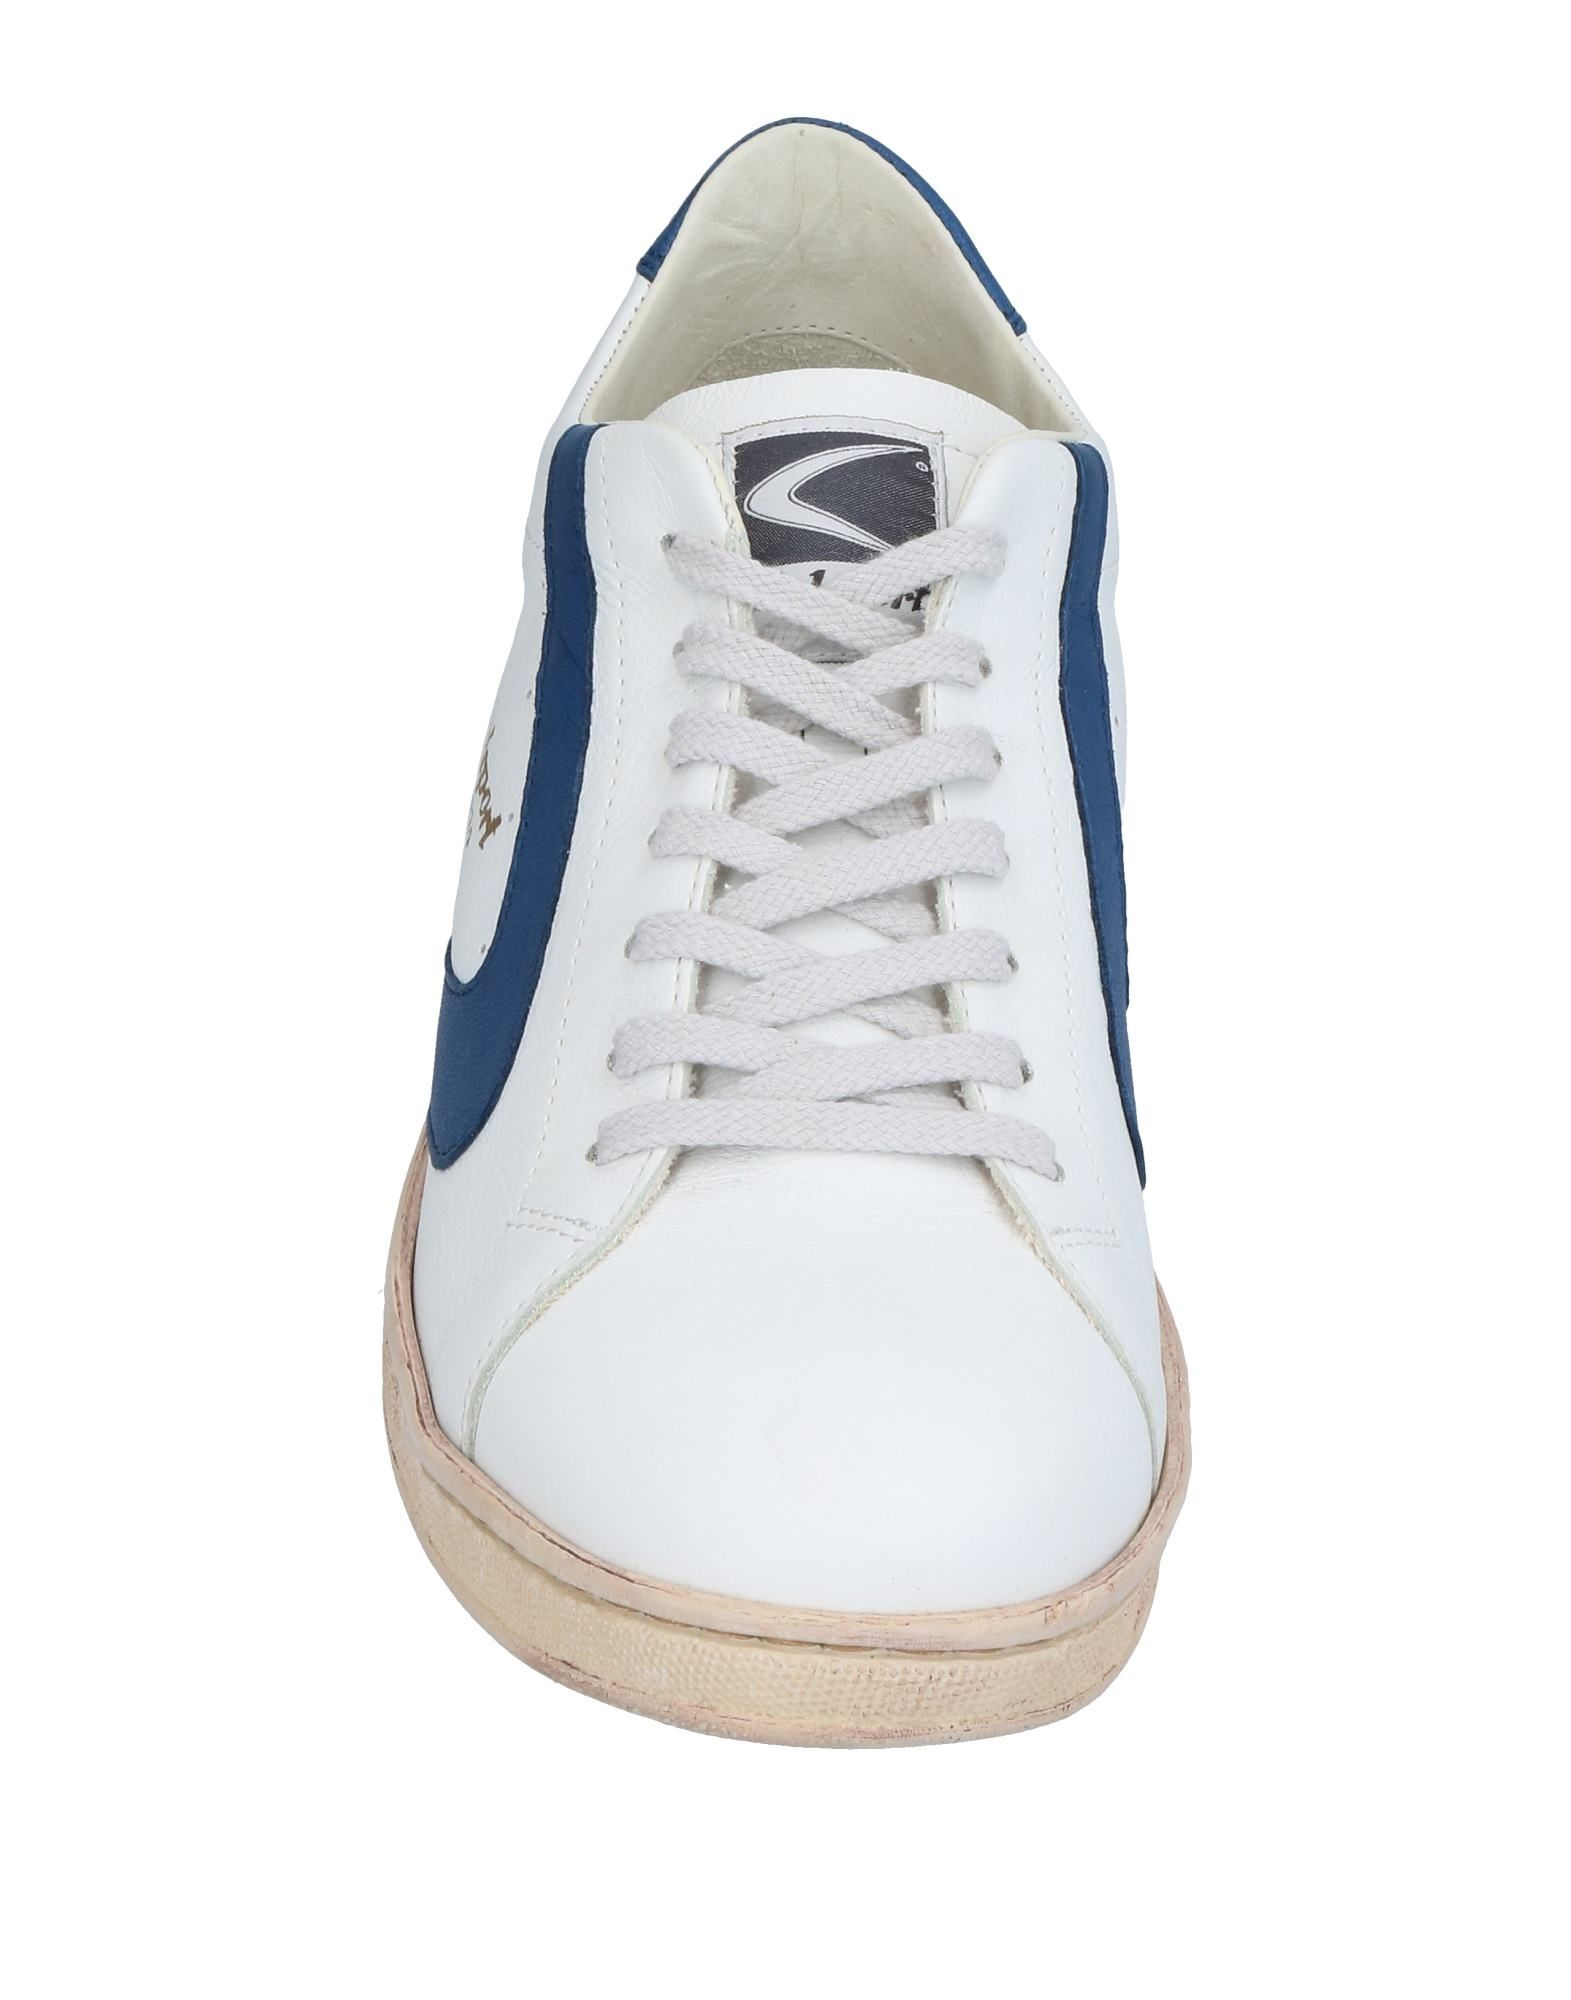 Rabatt echte Schuhe 11380910PM Valsport Sneakers Herren  11380910PM Schuhe 0559eb